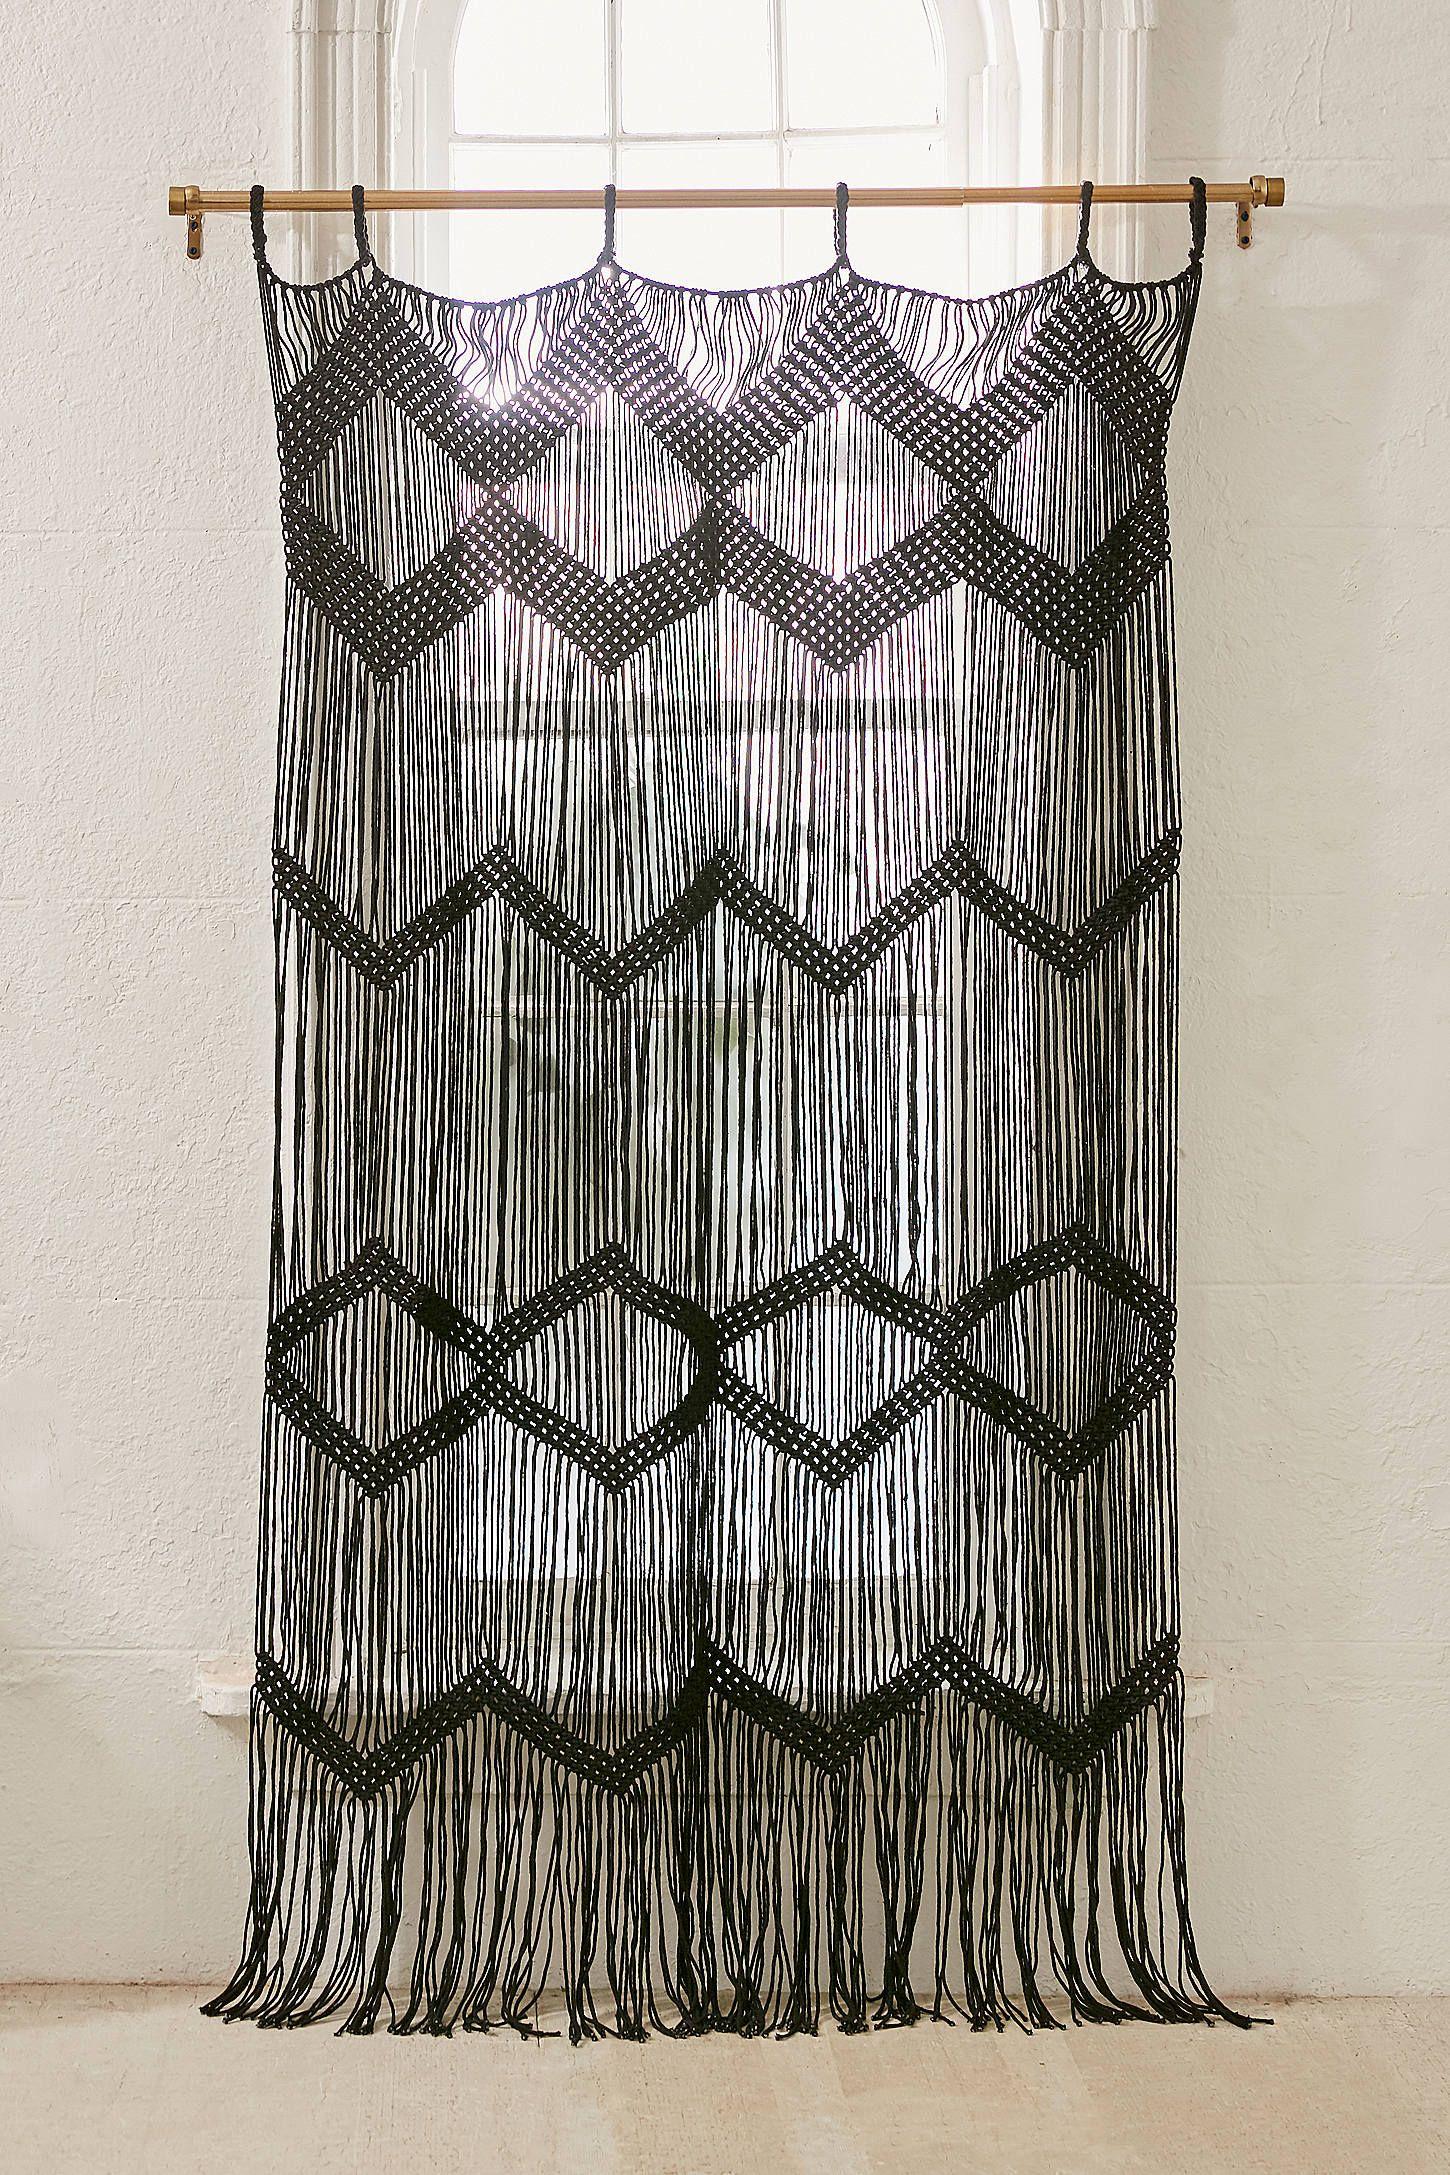 Meadowsweet Macrame Panel Beaded Curtains Macrame Curtain Curtains